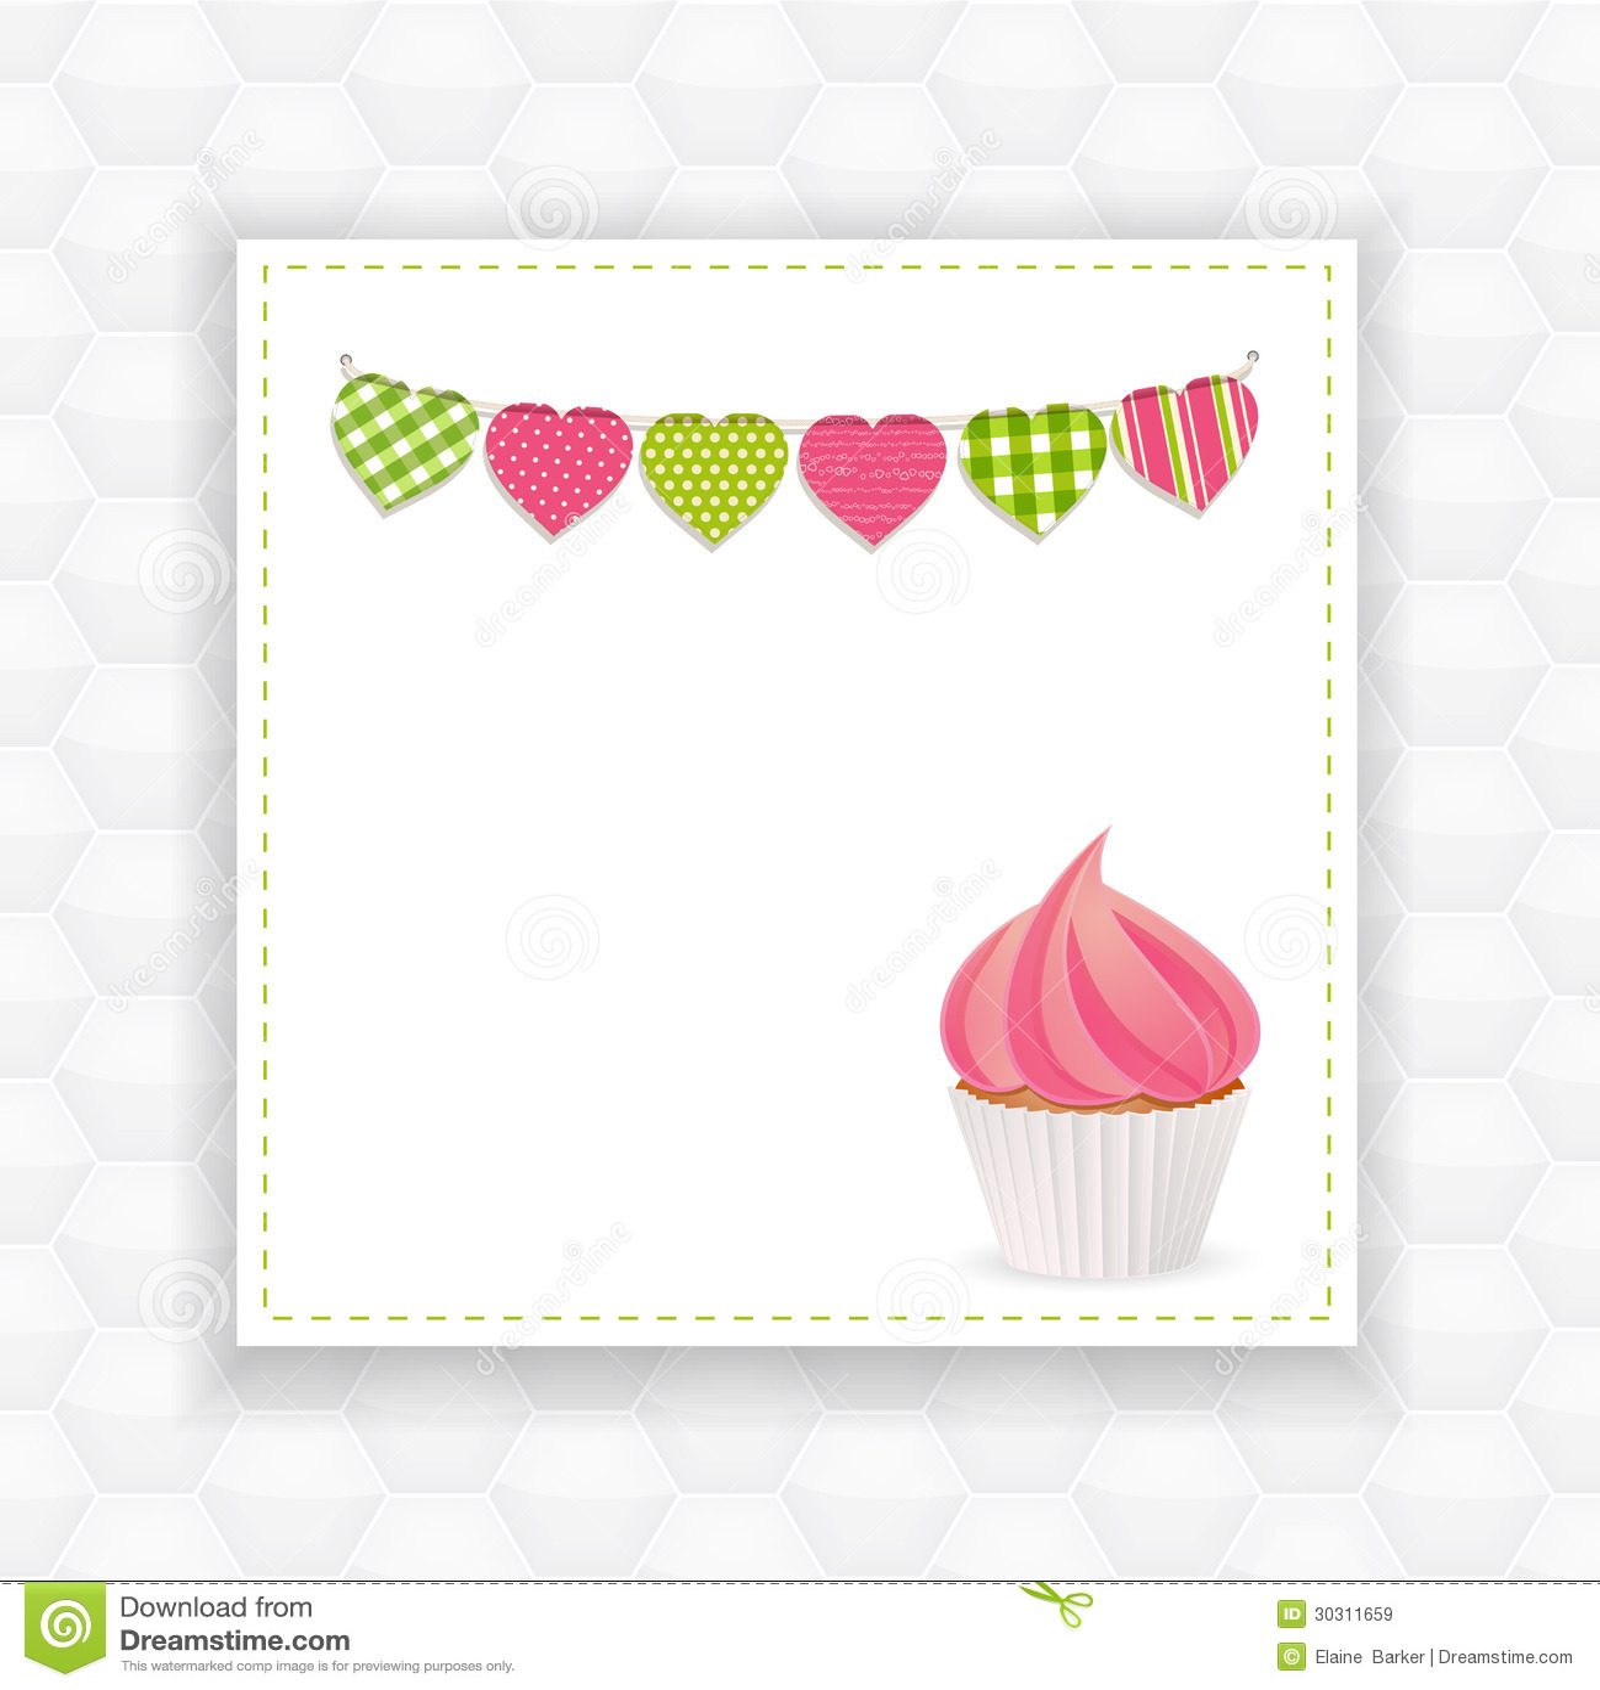 cupcake wedding cakes prices